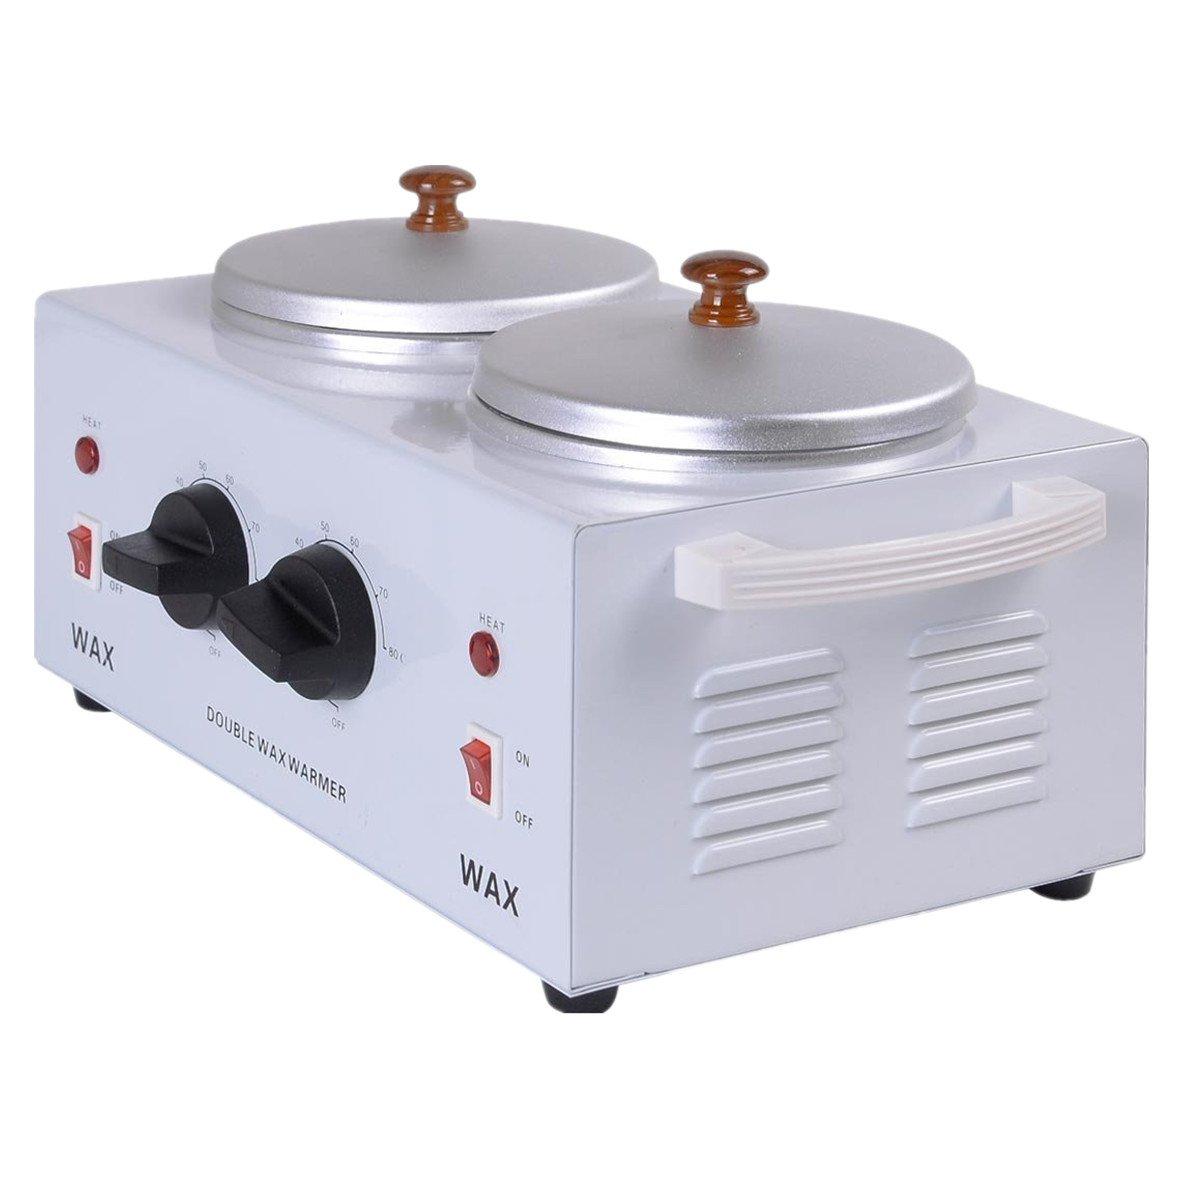 Super buy Electric Double Pot Wax Warmer Heater Professional Dual Pro Salon Hot Paraffin